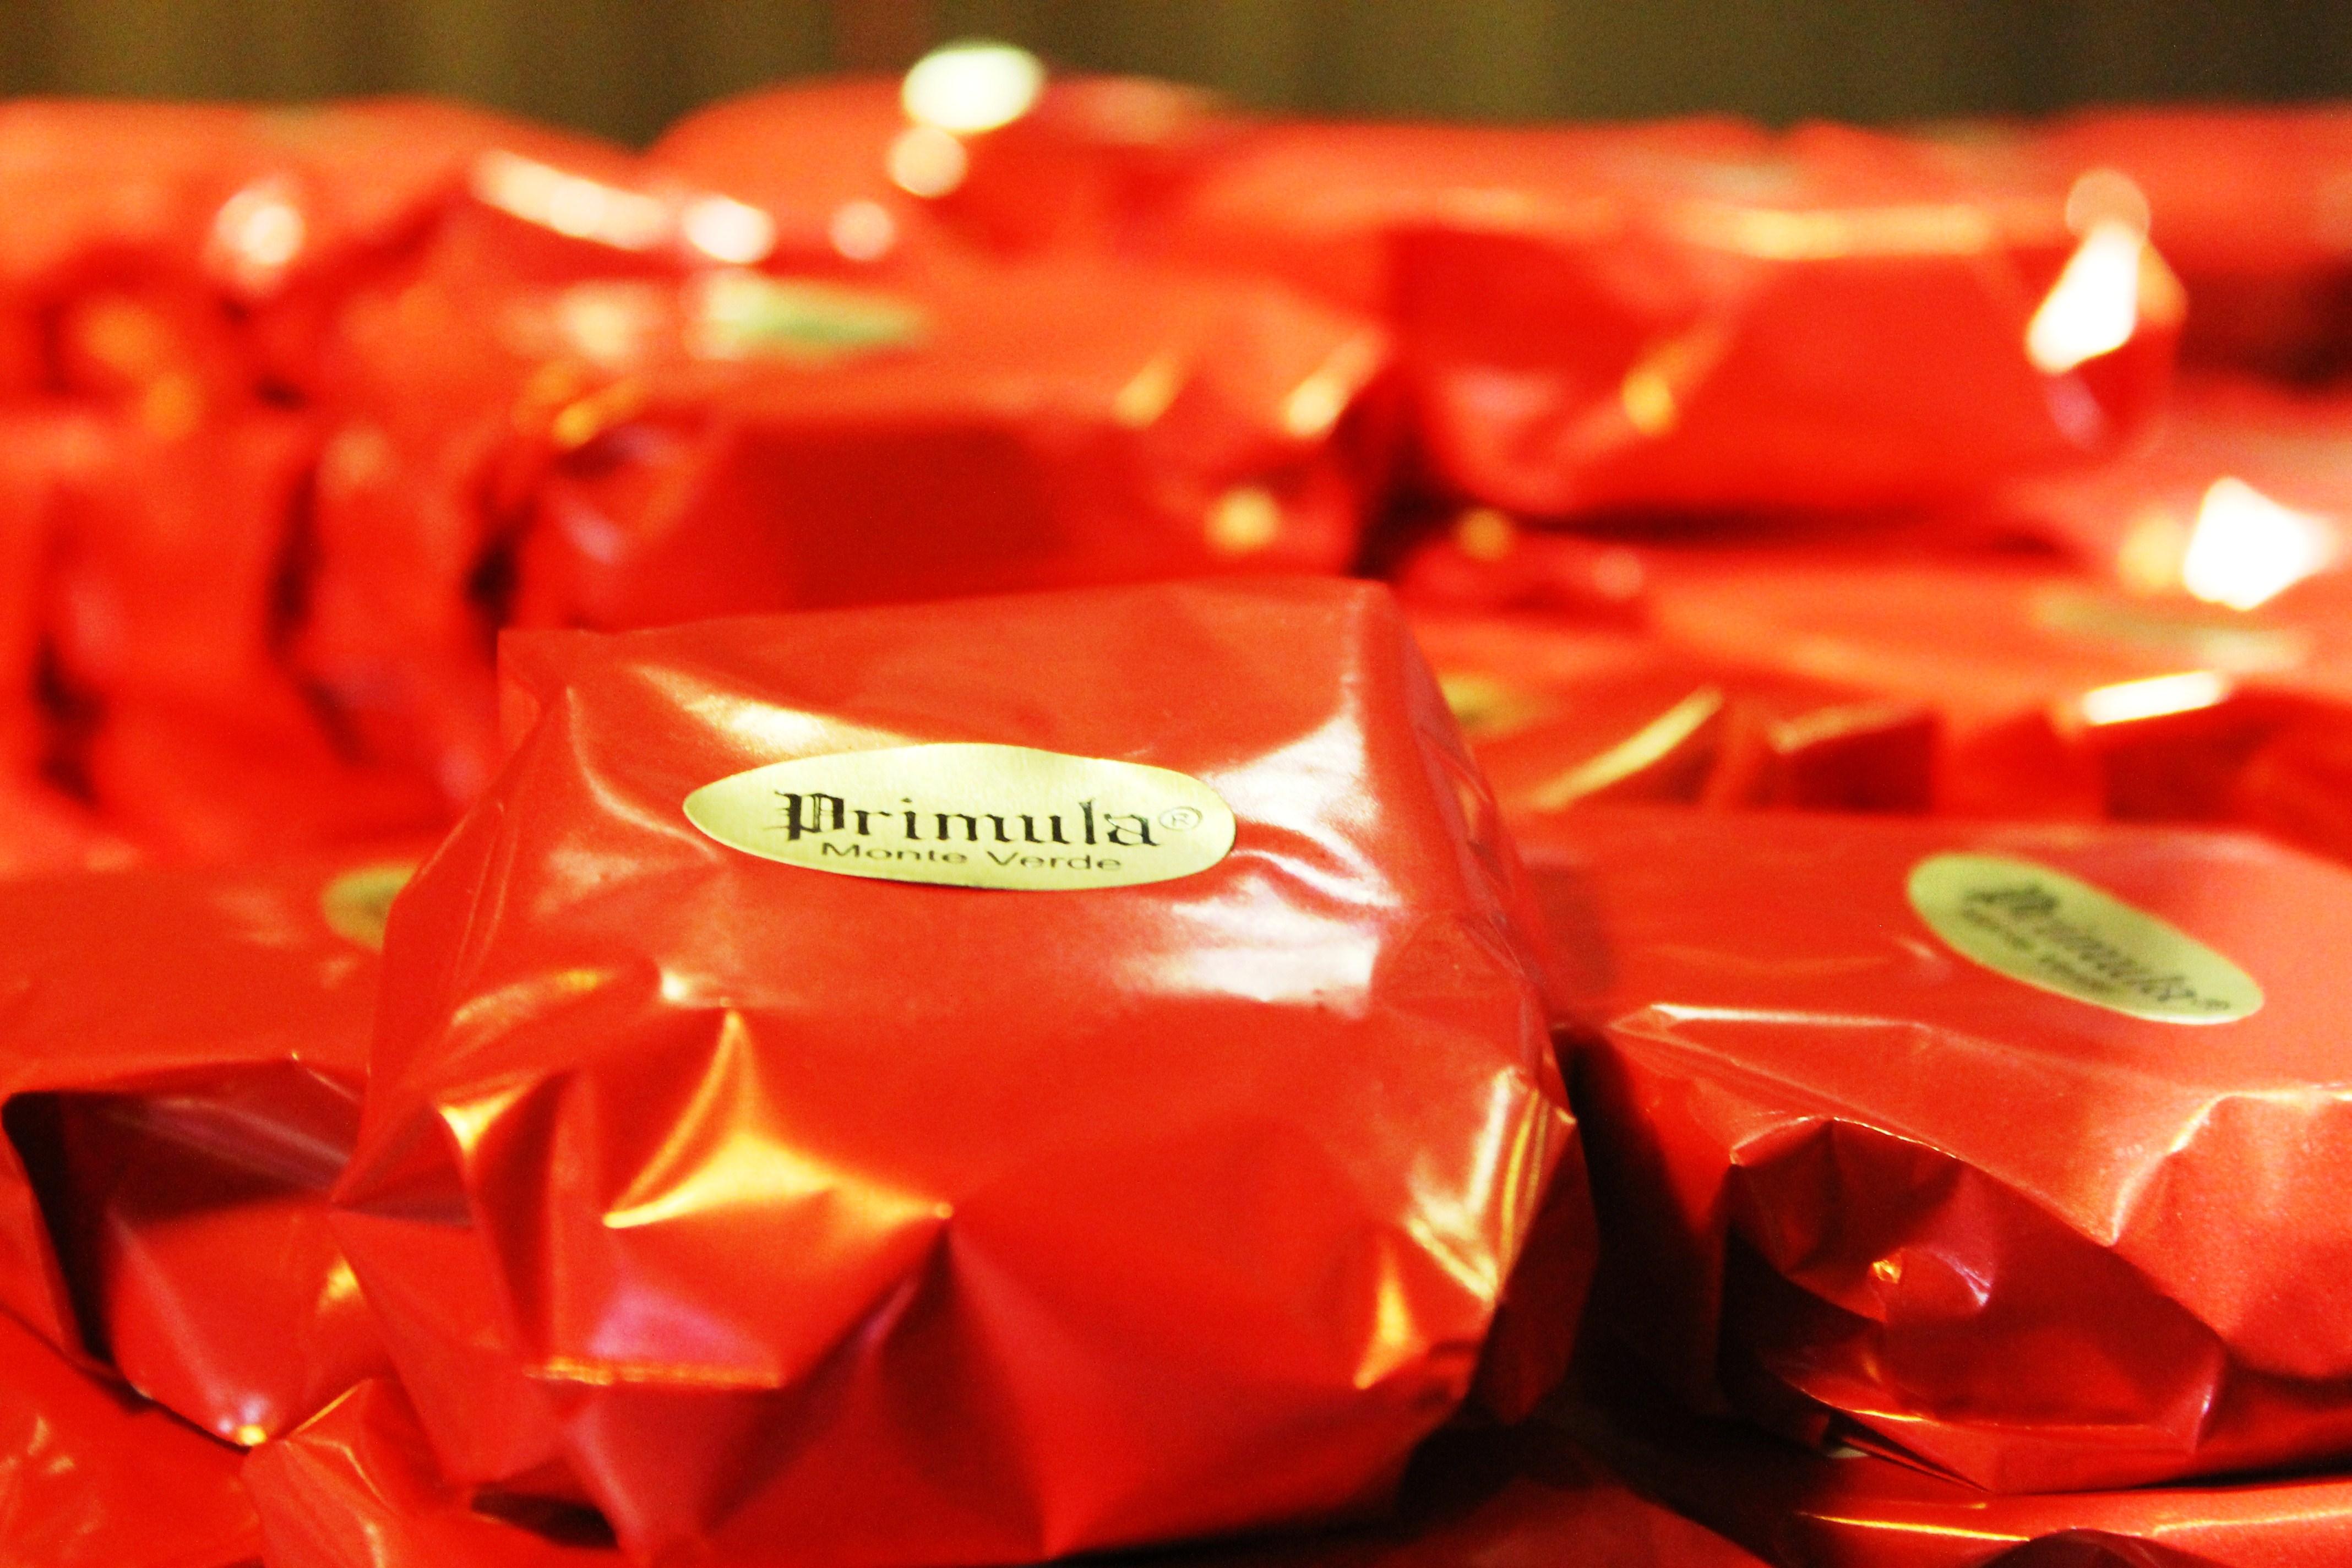 Fábrica de Chocolate - Prímula - Crédito Demétrio César Xavier